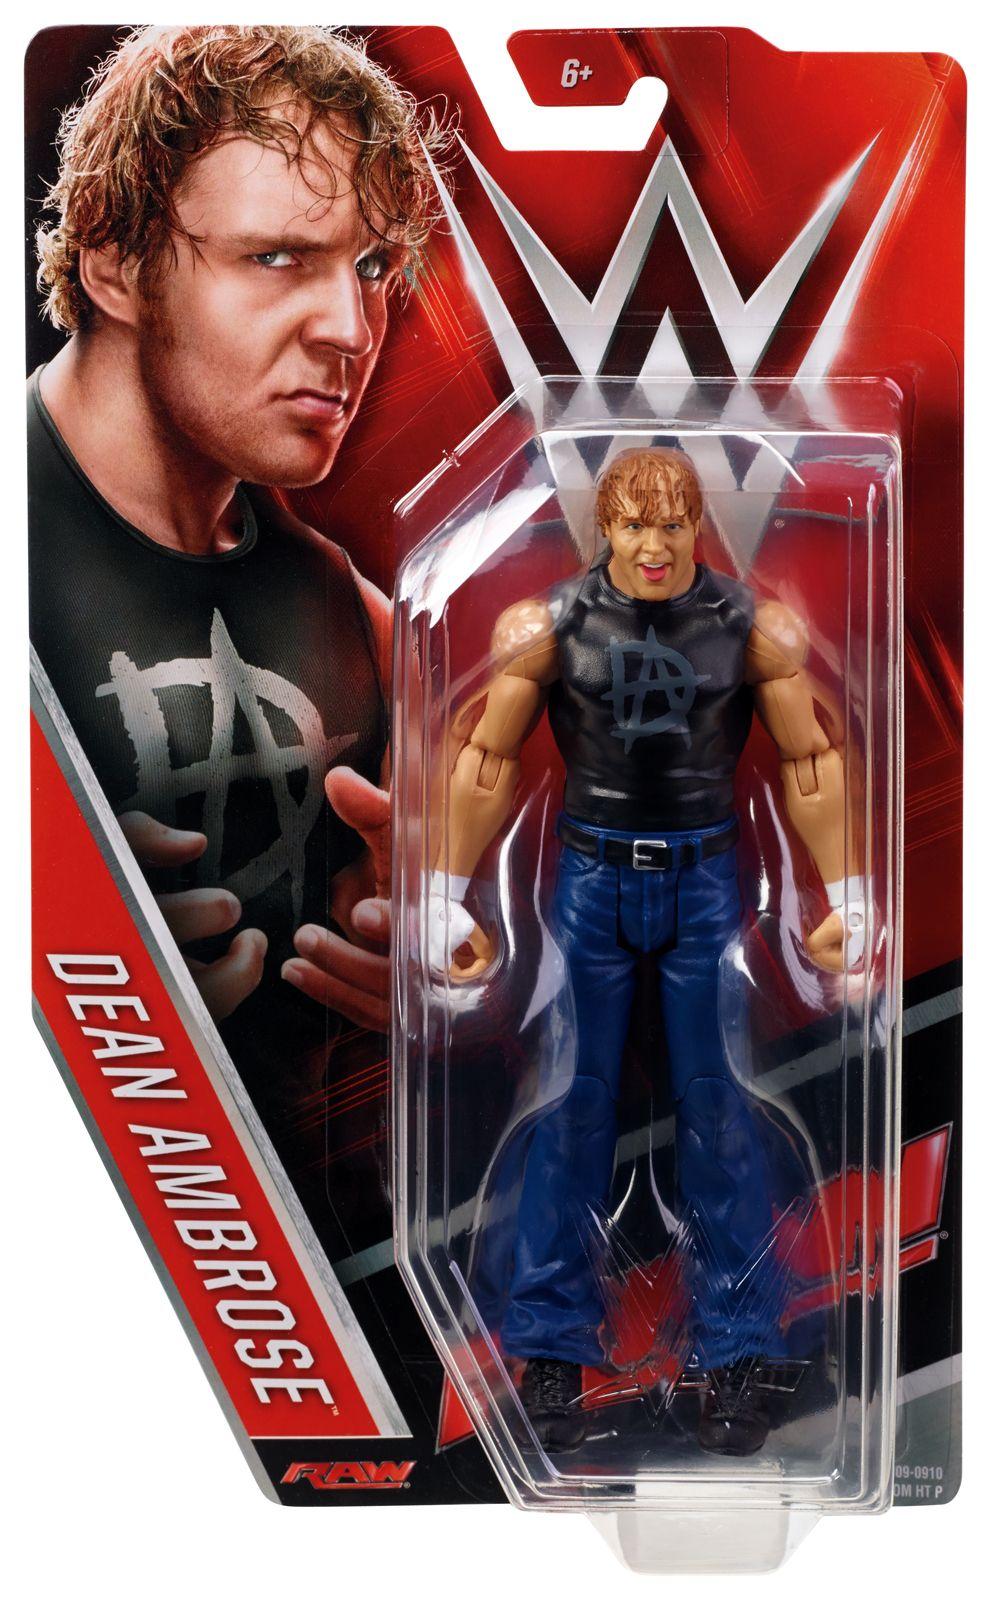 Randy Orton Mattel WWE 2015 Basic Series Red Action Figure RAW SMACKDOWN WWE